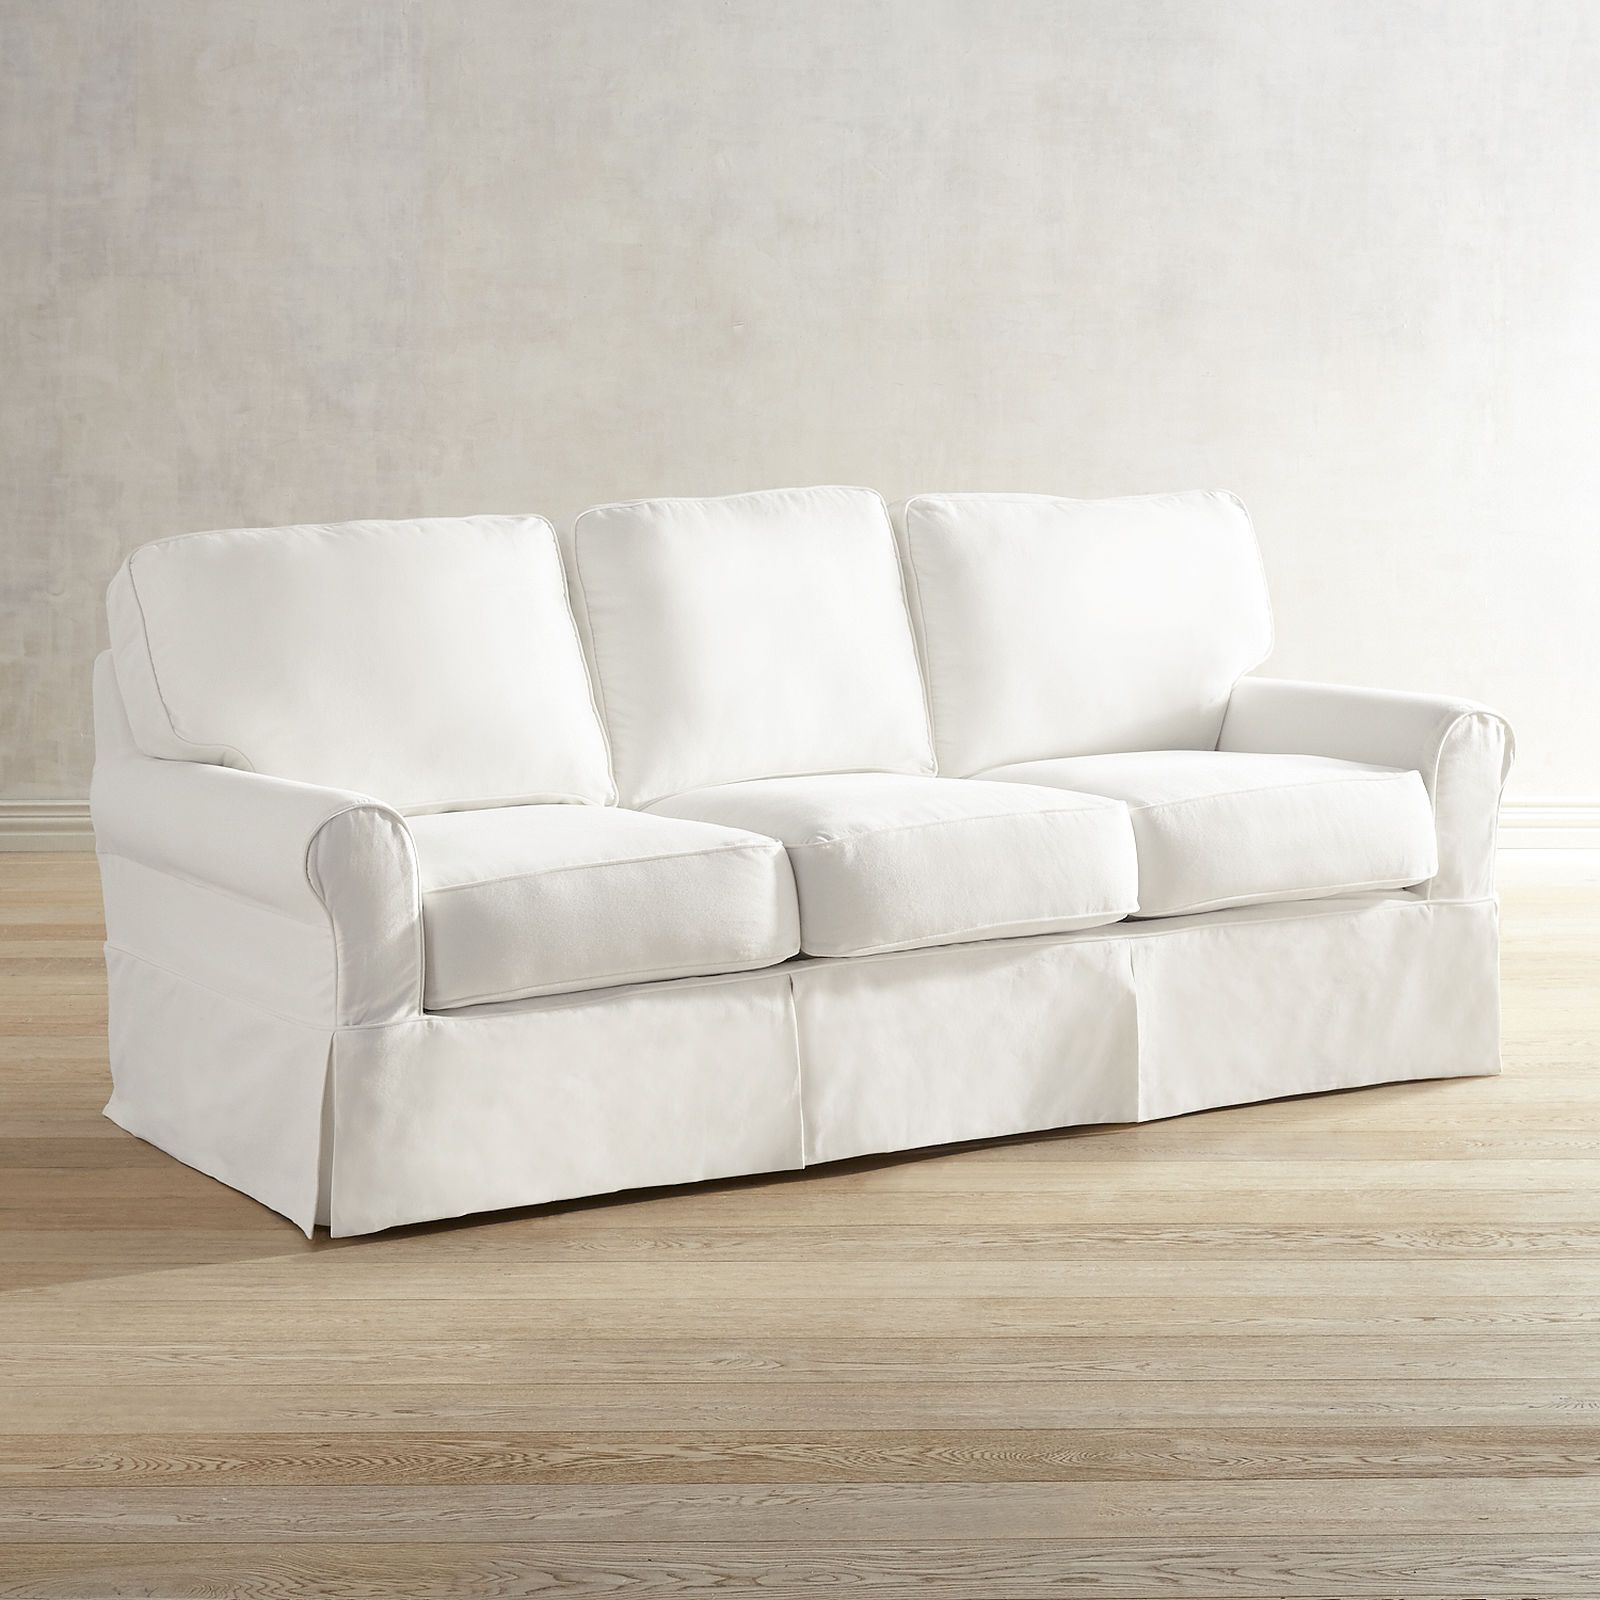 Lia Pierformance White Slipcovered Sofa White Slipcover Couch